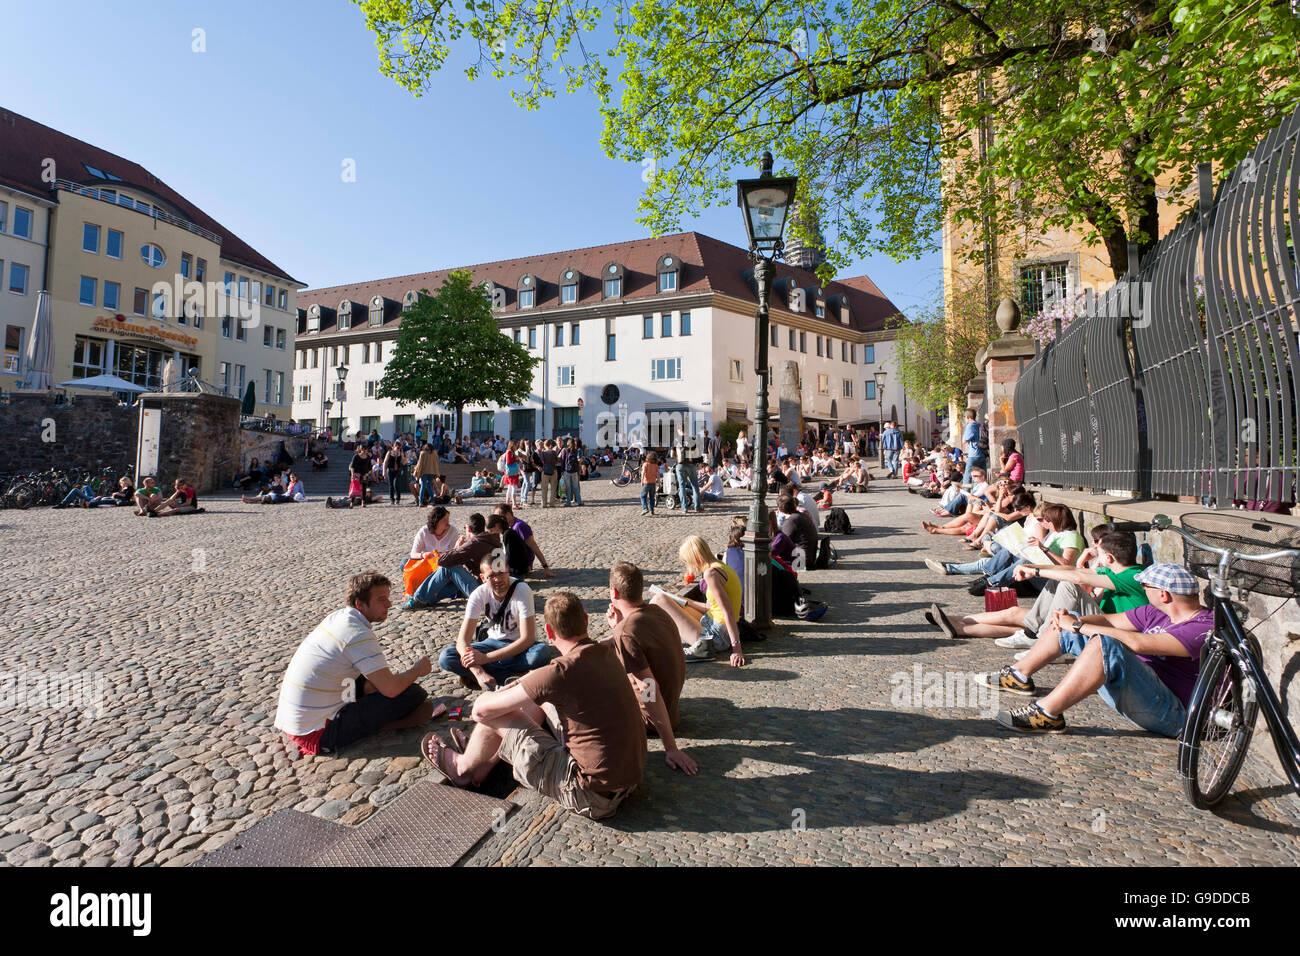 Augustinerplatz square, students, student life, Freiburg im Breisgau, Black Forest, Baden-Wuerttemberg - Stock Image